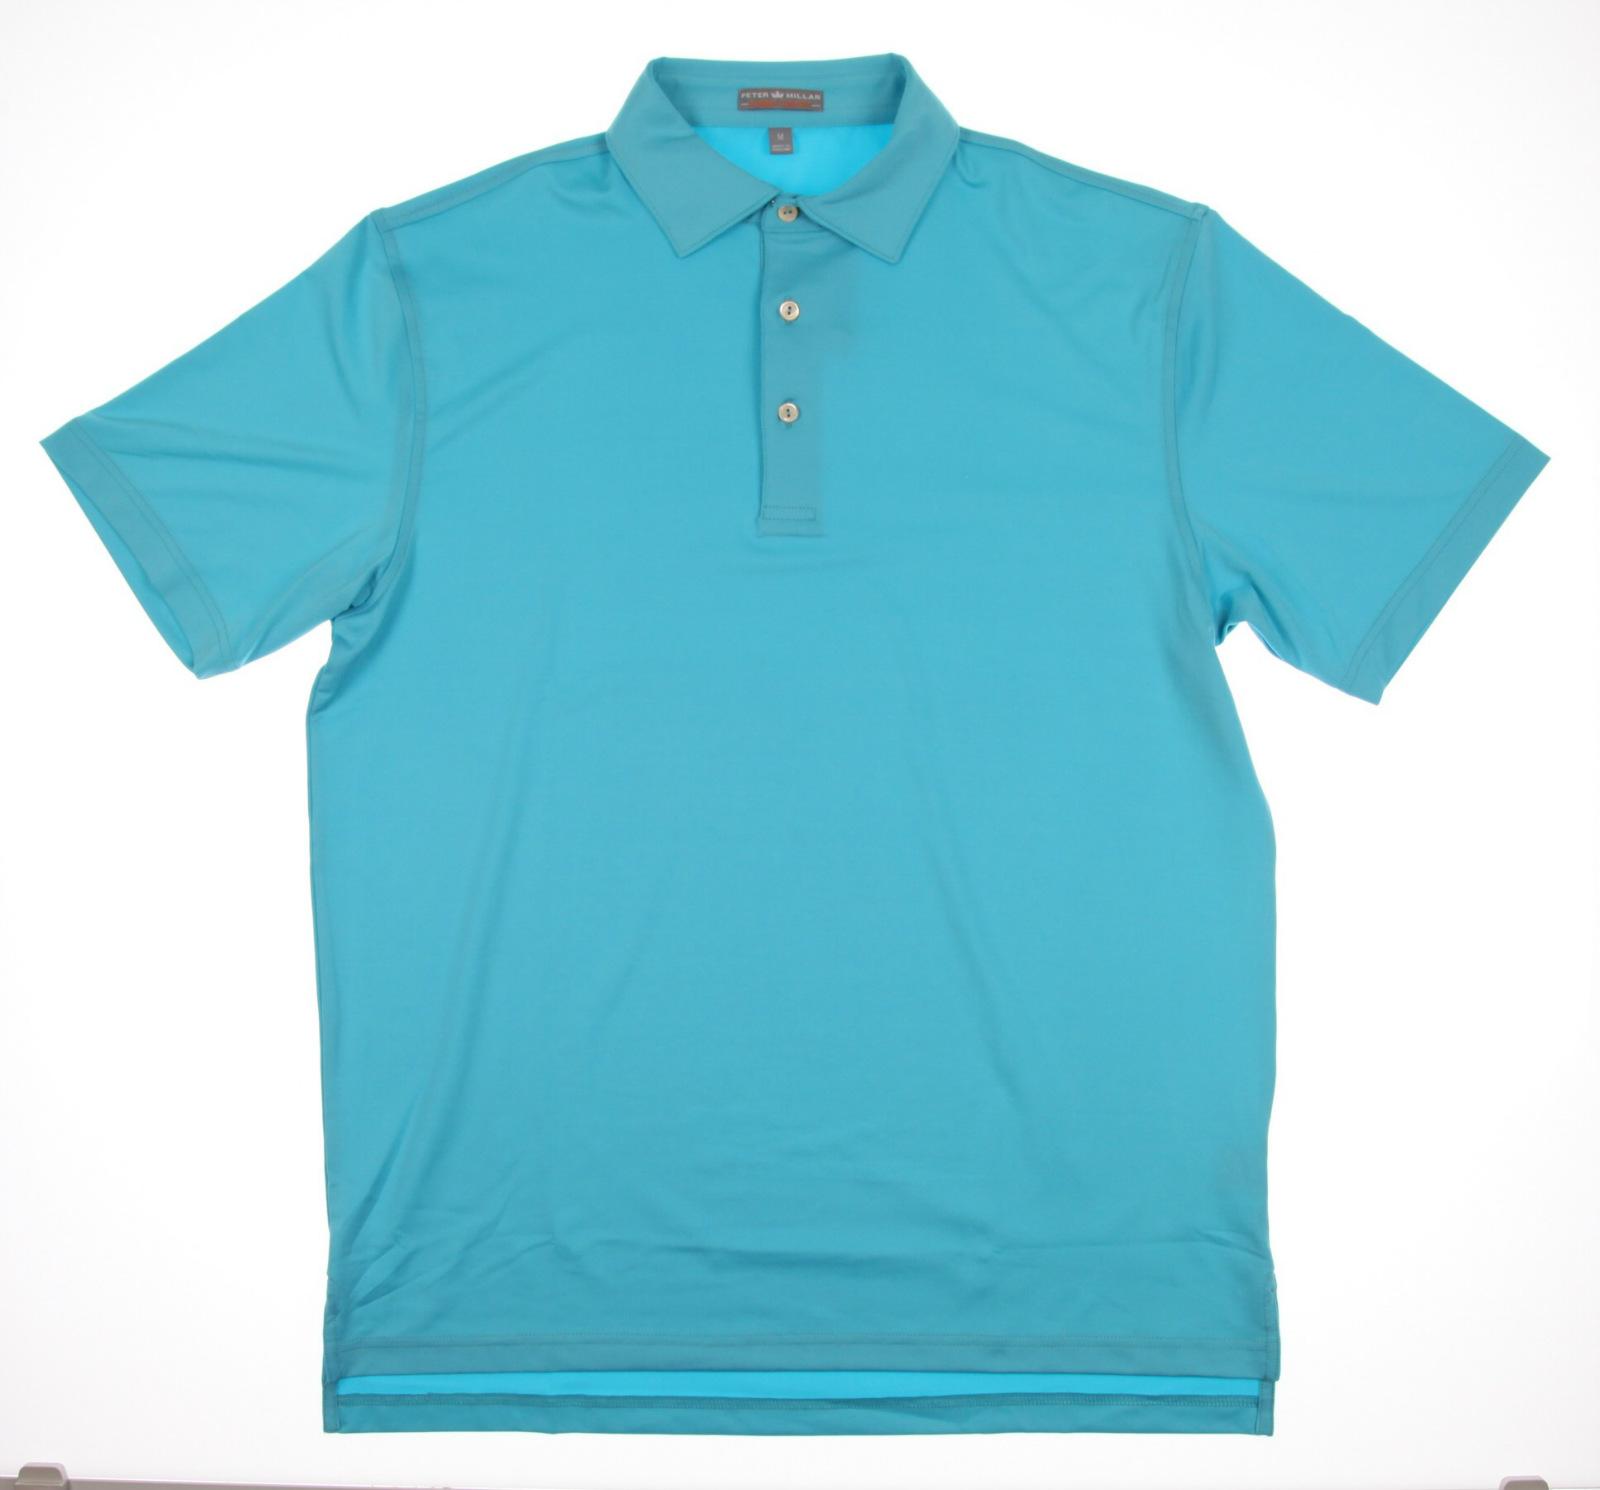 New Men 39 S Peter Millar Polo Golf Shirt Turquoise Sz Medium